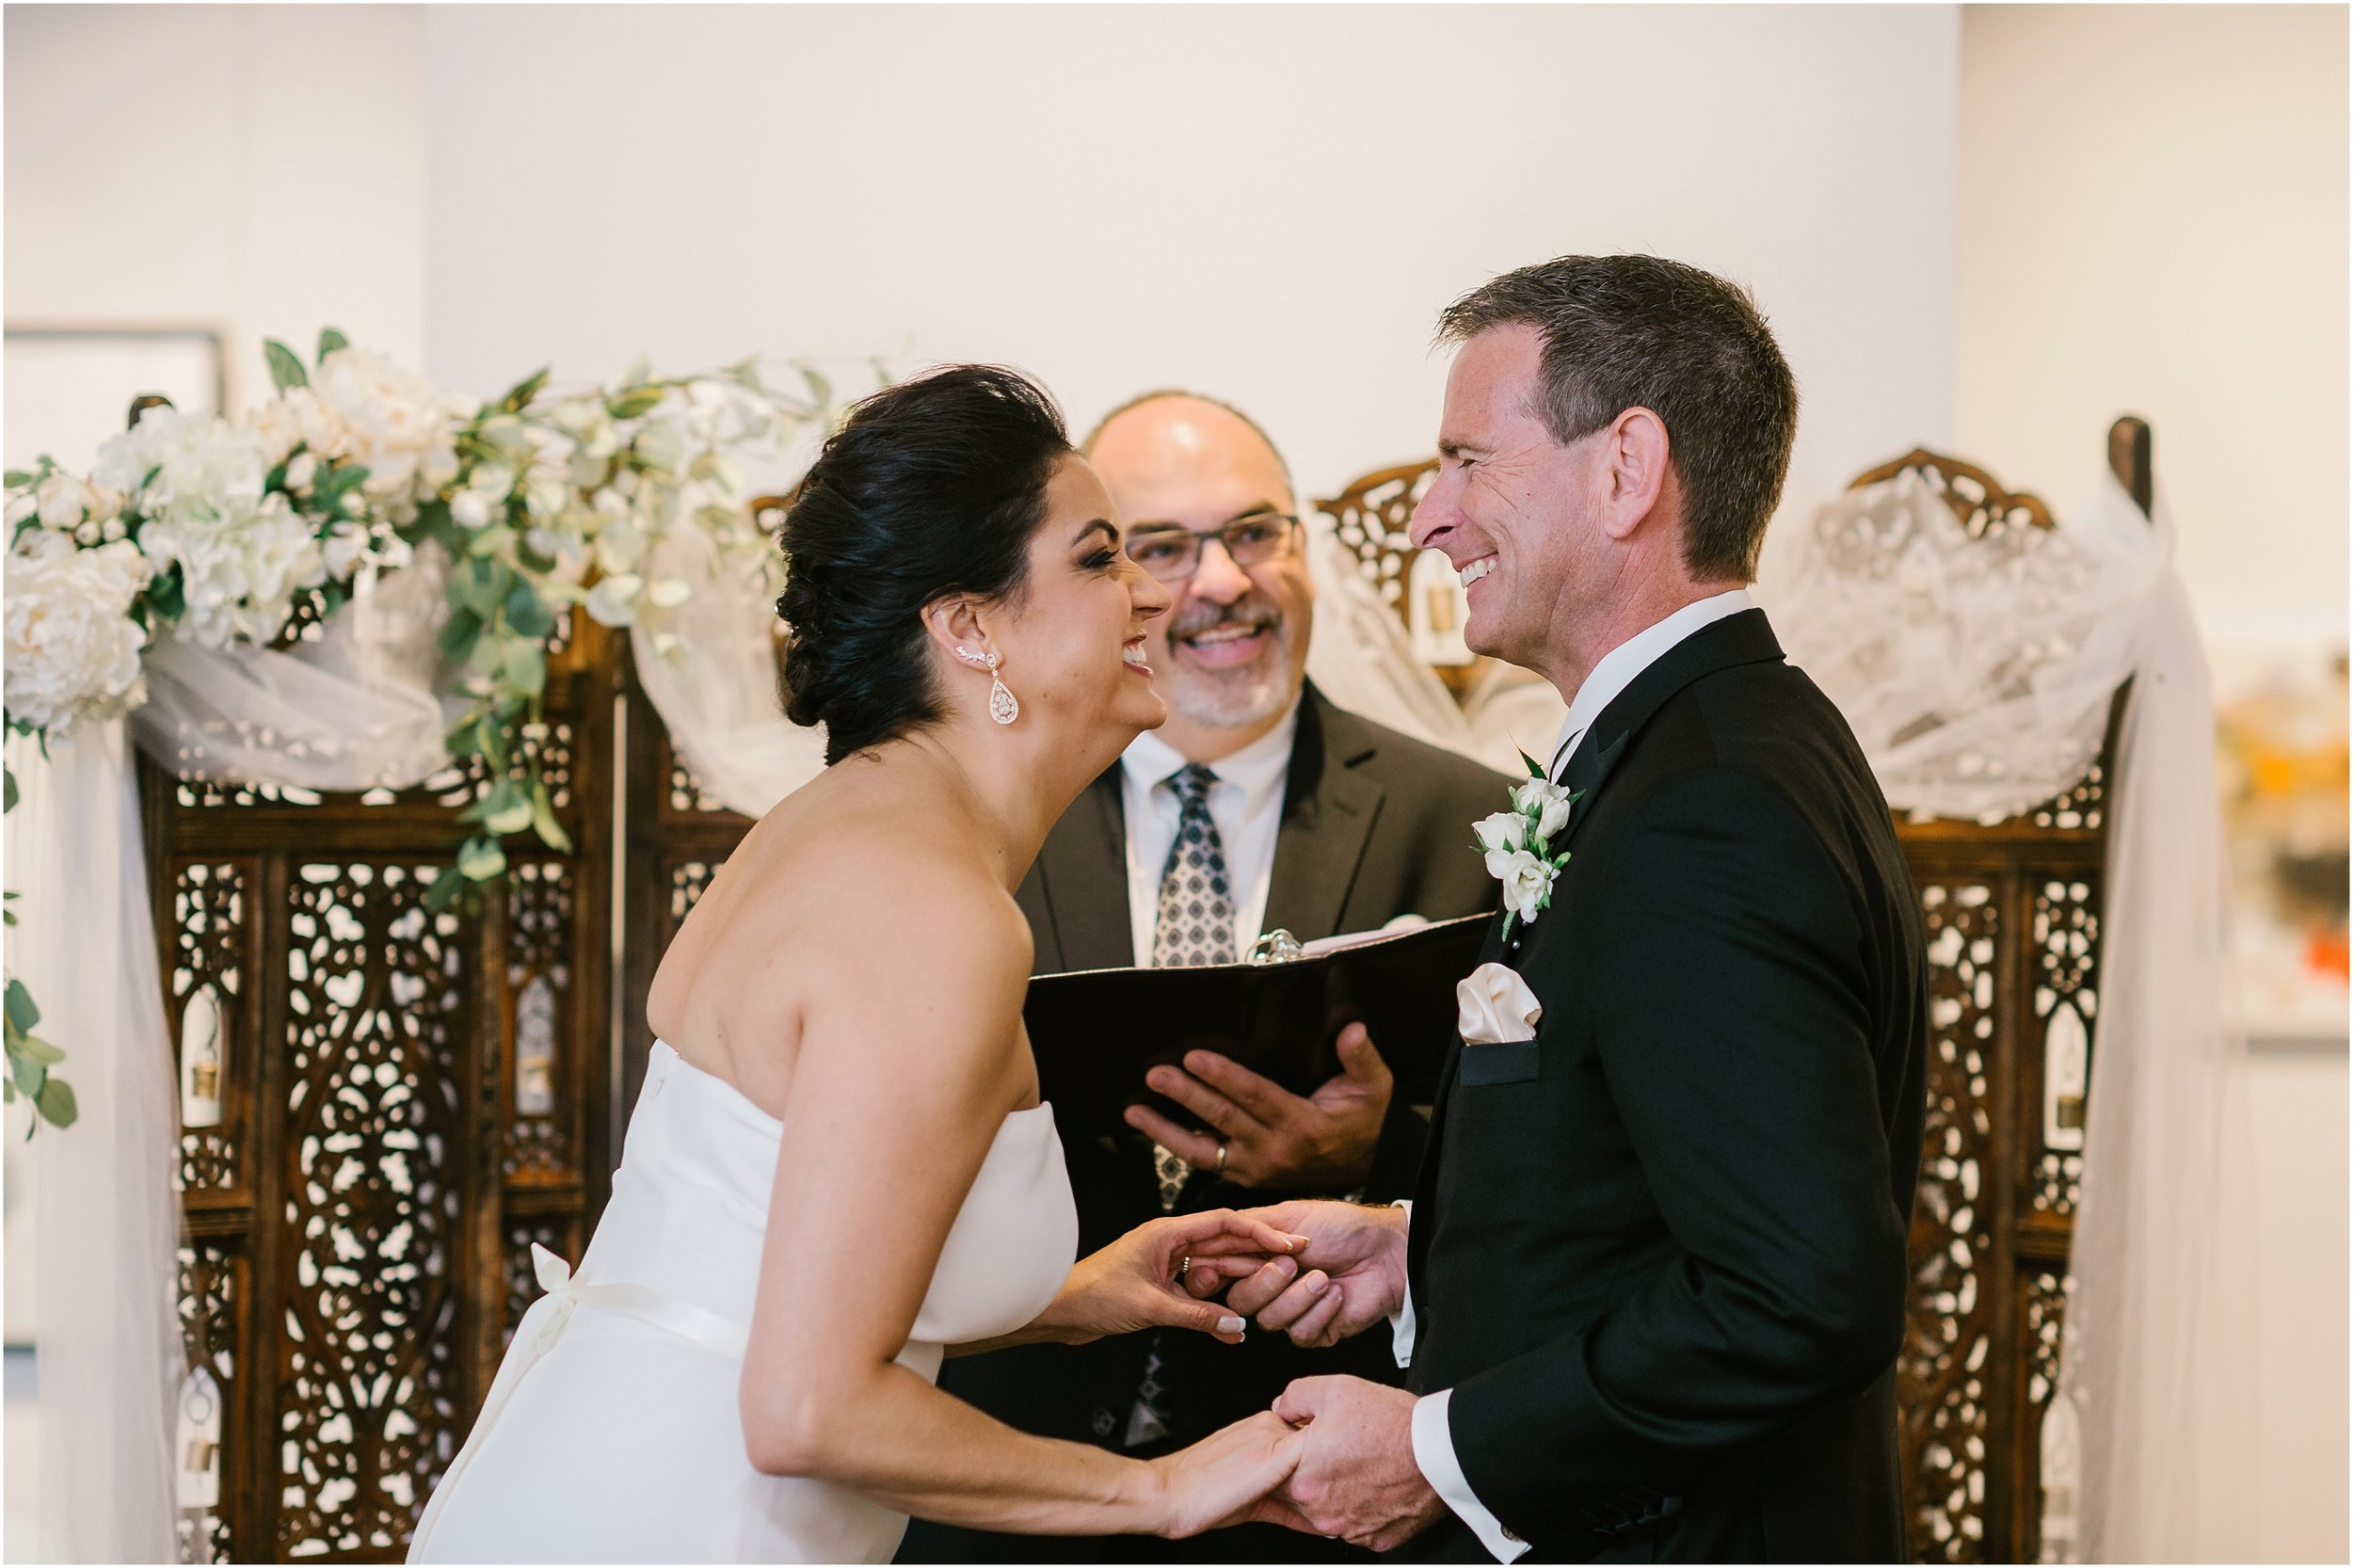 Rebecca_Shehorn_Photography_Indianapolis_Wedding_Photographer_8558.jpg